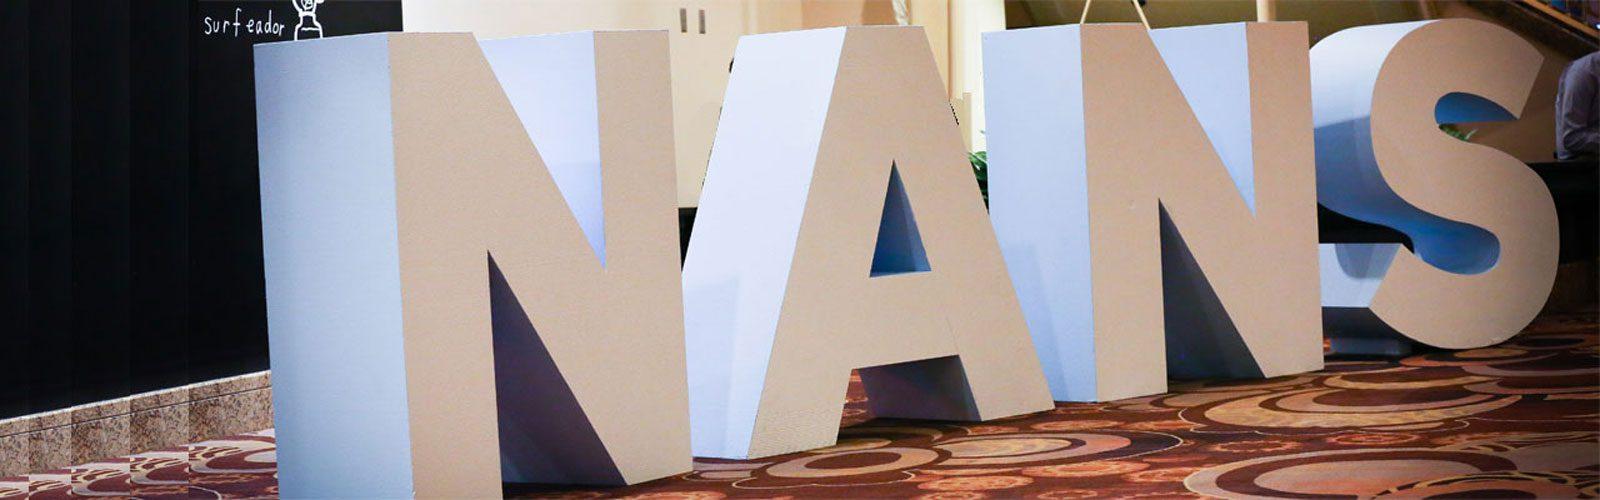 North American Neuromodulation Society (NANS), Scientific Program Chair